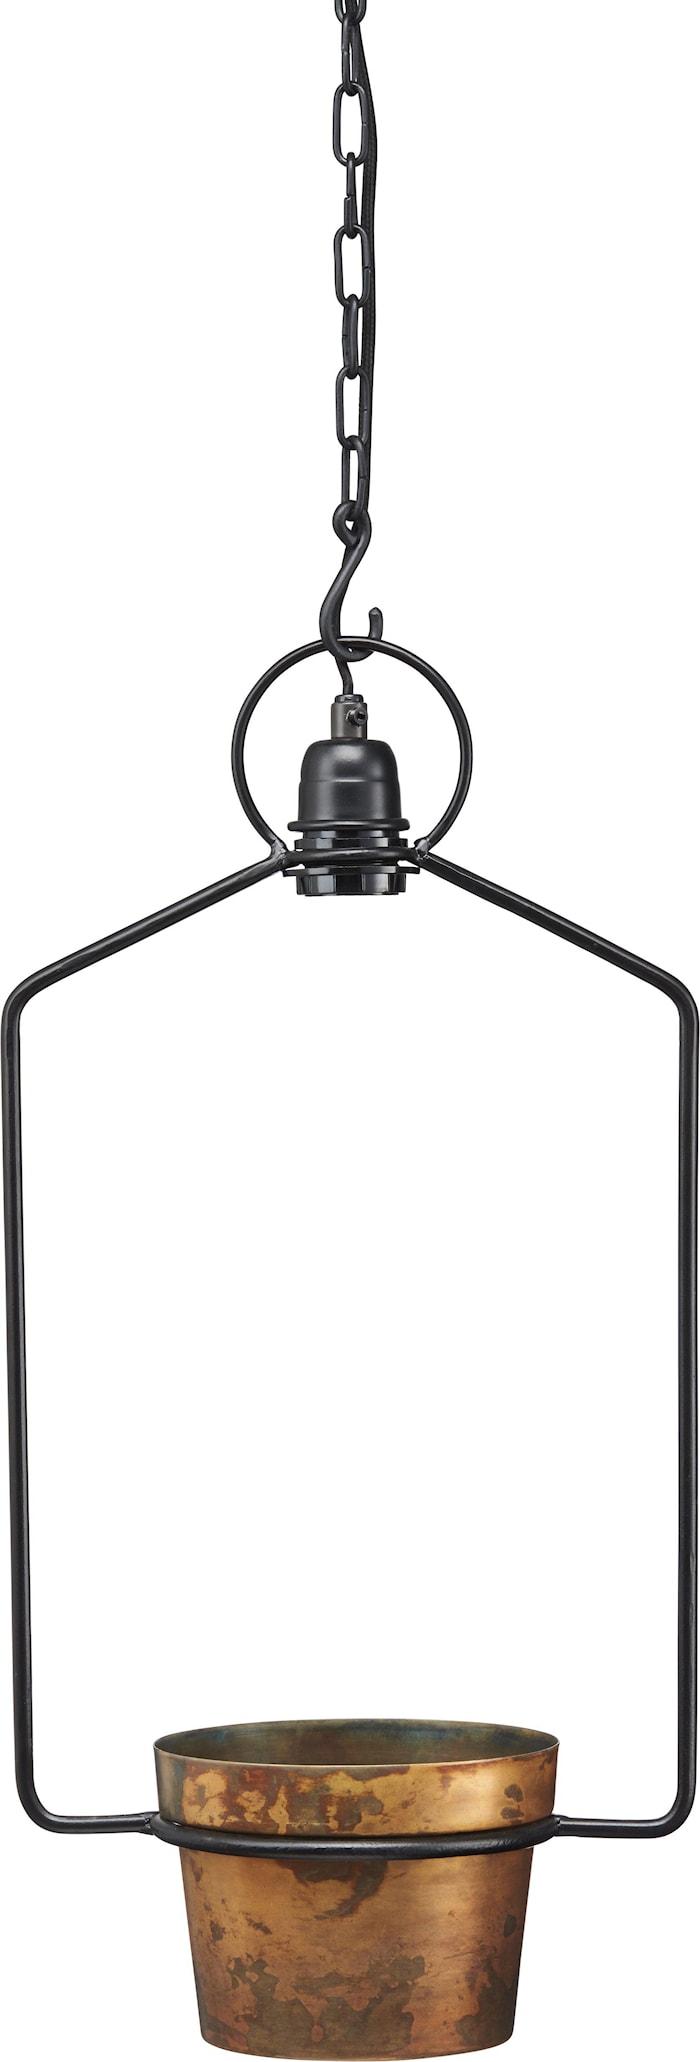 Upptown Fönsterlampa Svart 57cm